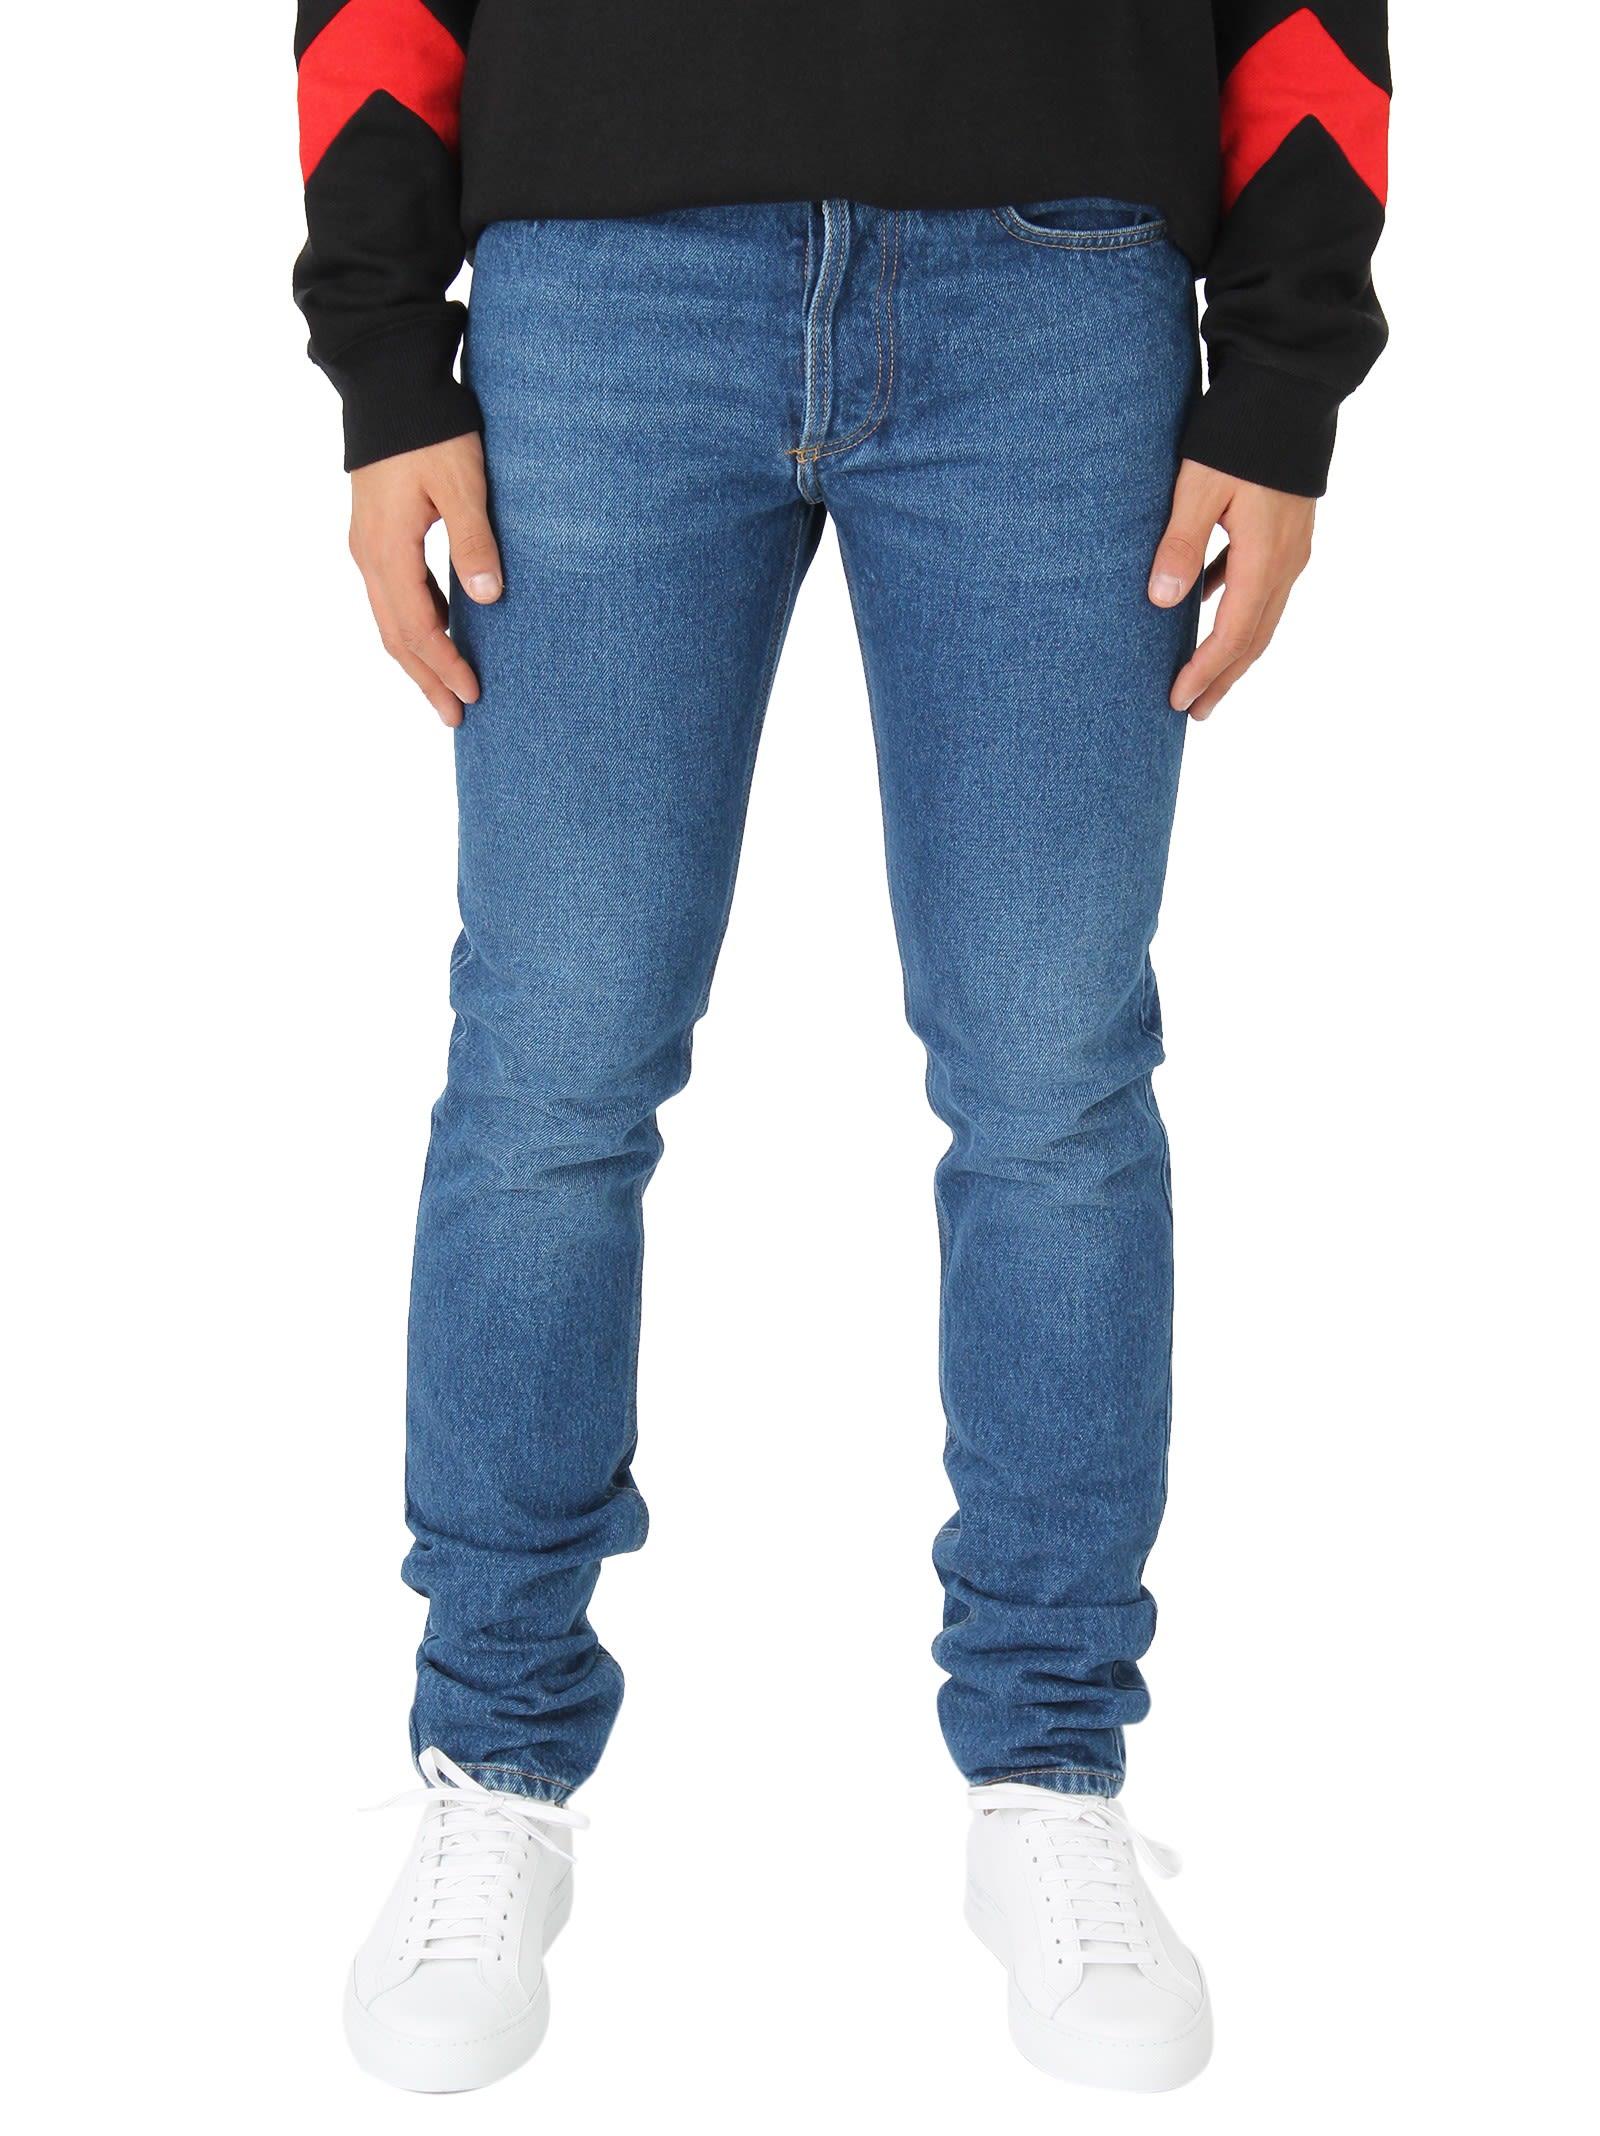 Givenchy Logo Blue Jeans 9879297